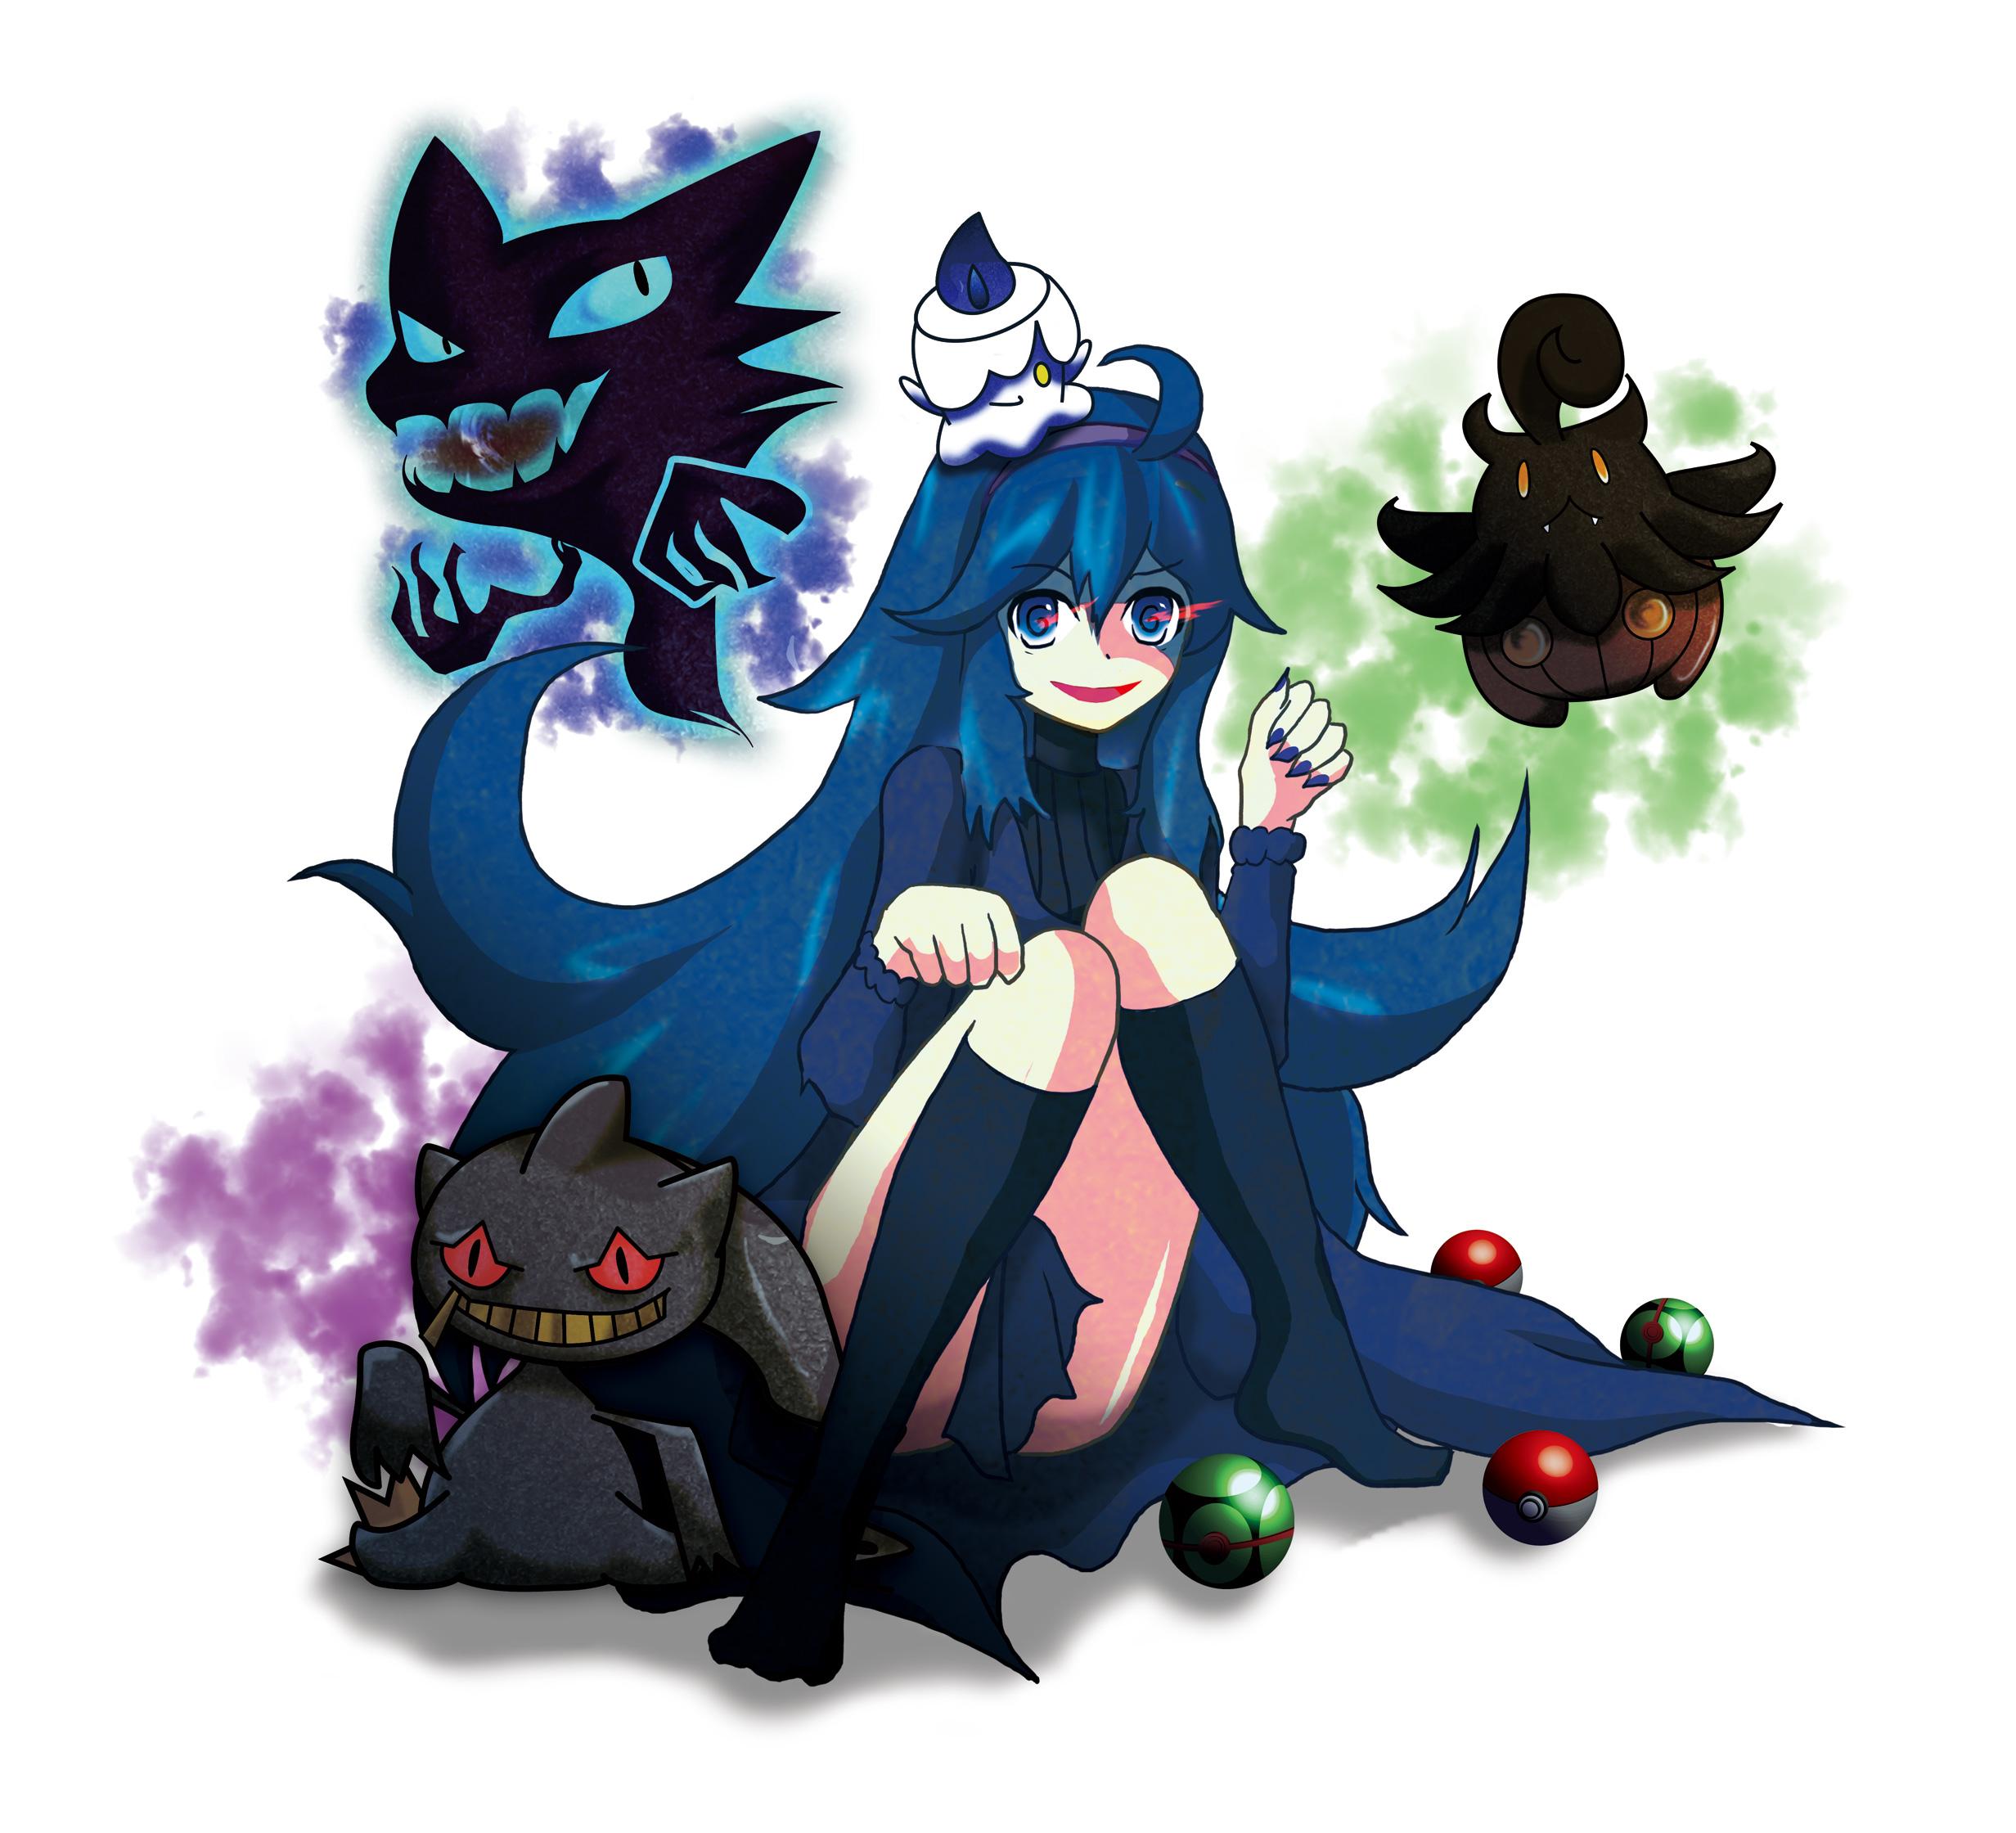 Banette haunter hex maniac litwick and pumpkaboo - Branette pokemon y ...